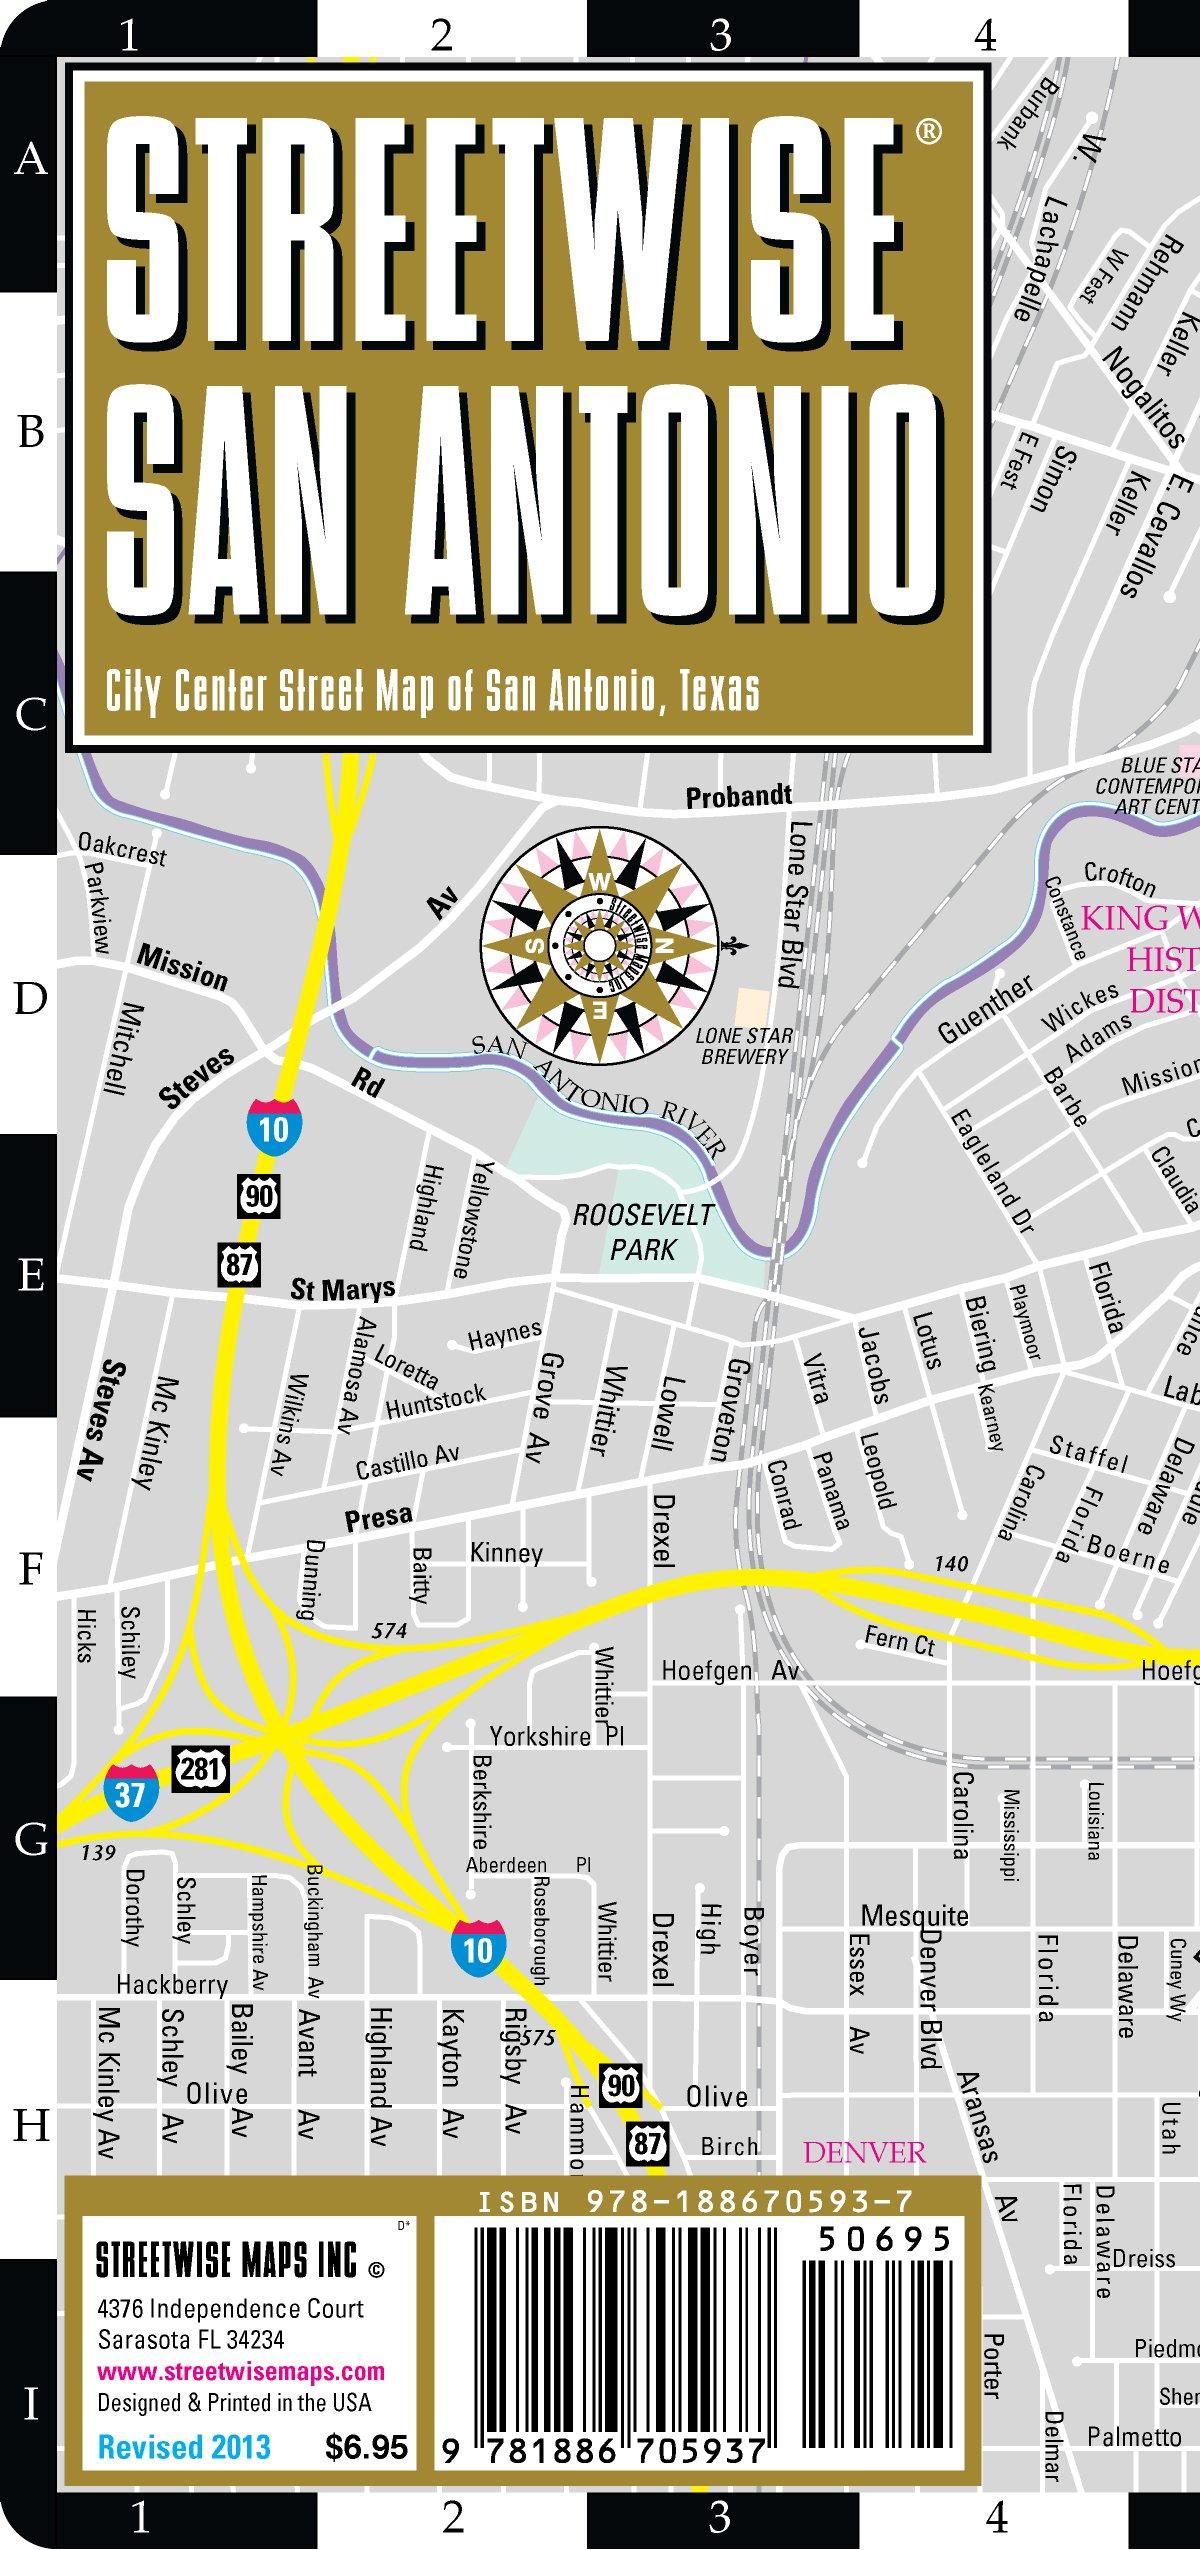 Streetwise San Antonio Map - Laminated City Center Street Map of San ...